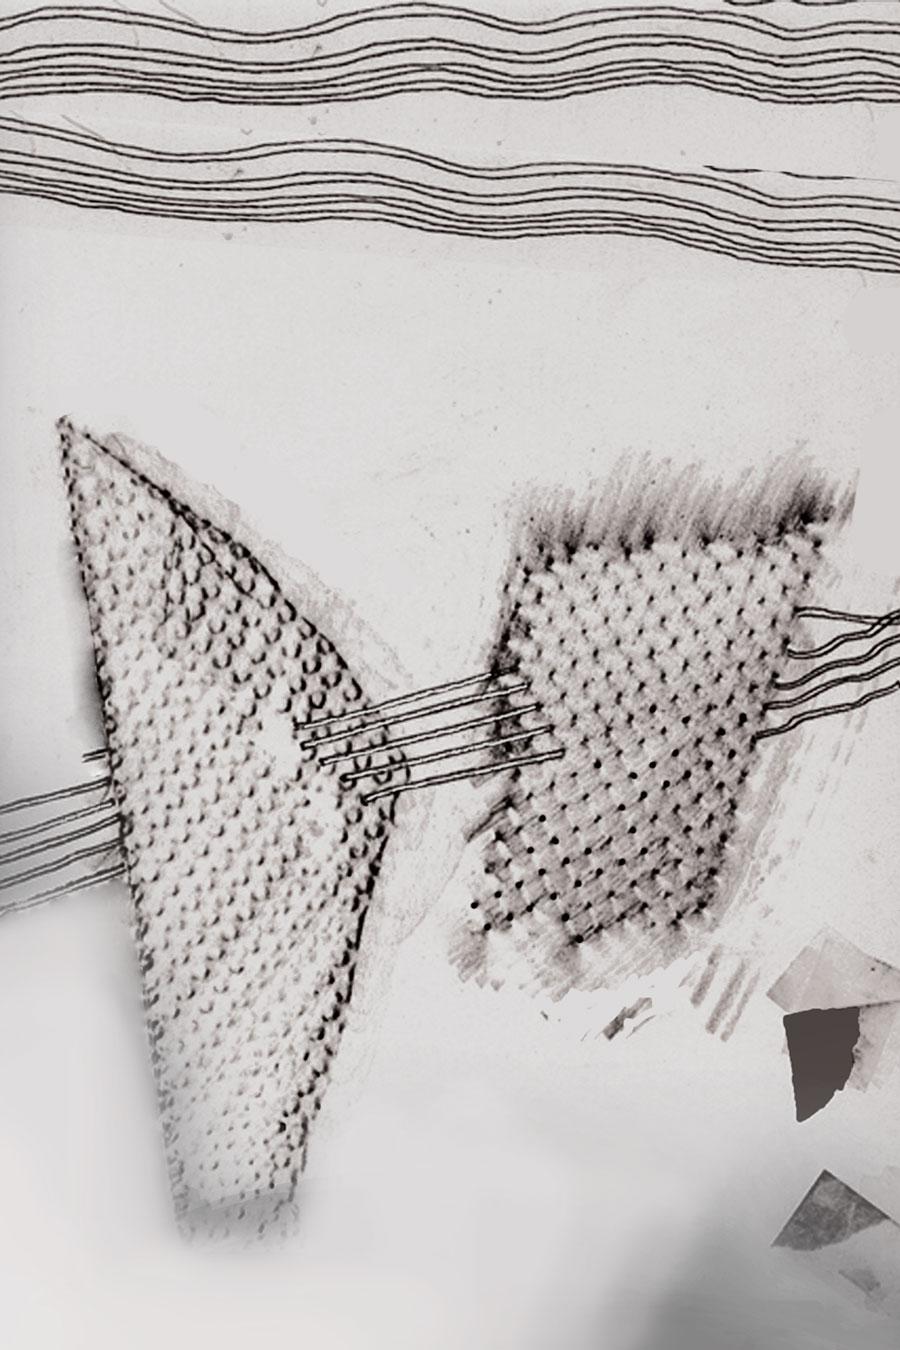 marion-llewellyn-gallery-drawing-13